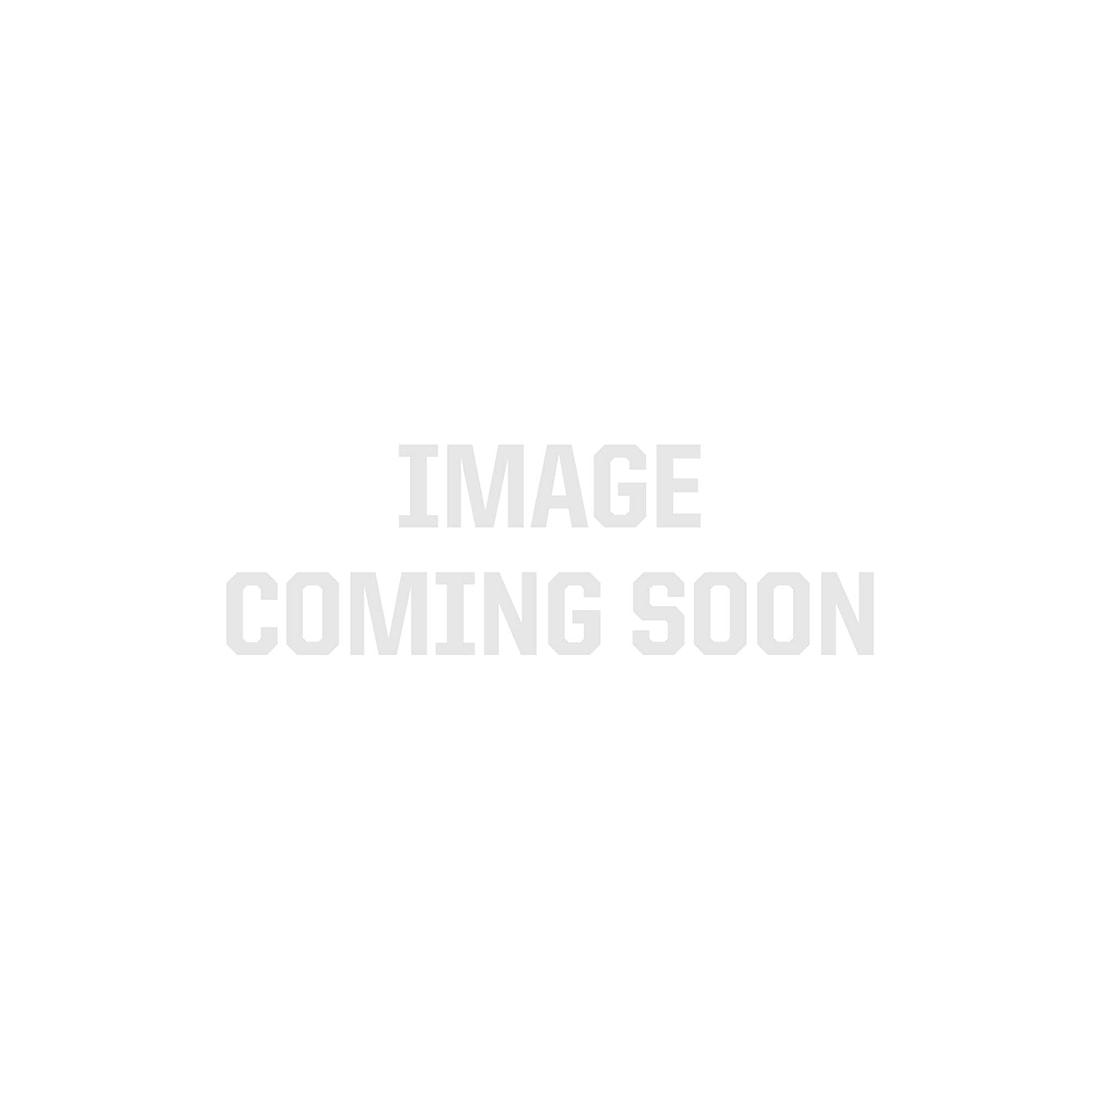 Leviton IPL06 Illumatech CFL/LED Dimmer; 150 Watt, Single Pole or 3-Way (Multi-location)